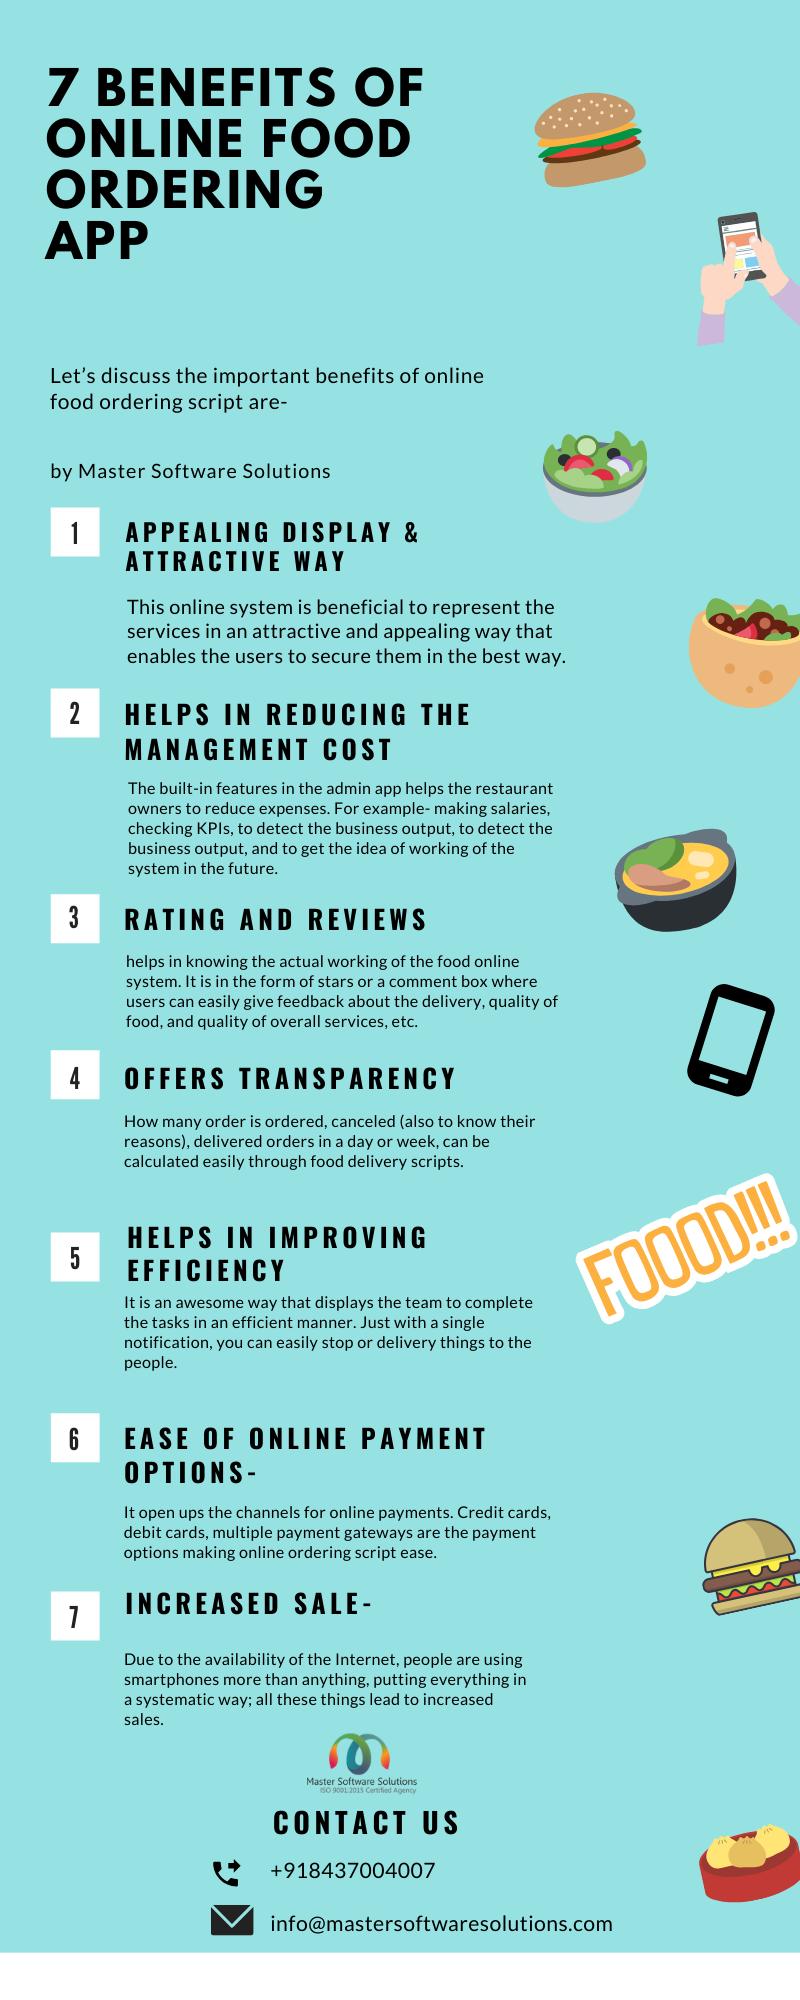 7 Benefits Of Online Food Ordering App #infographic